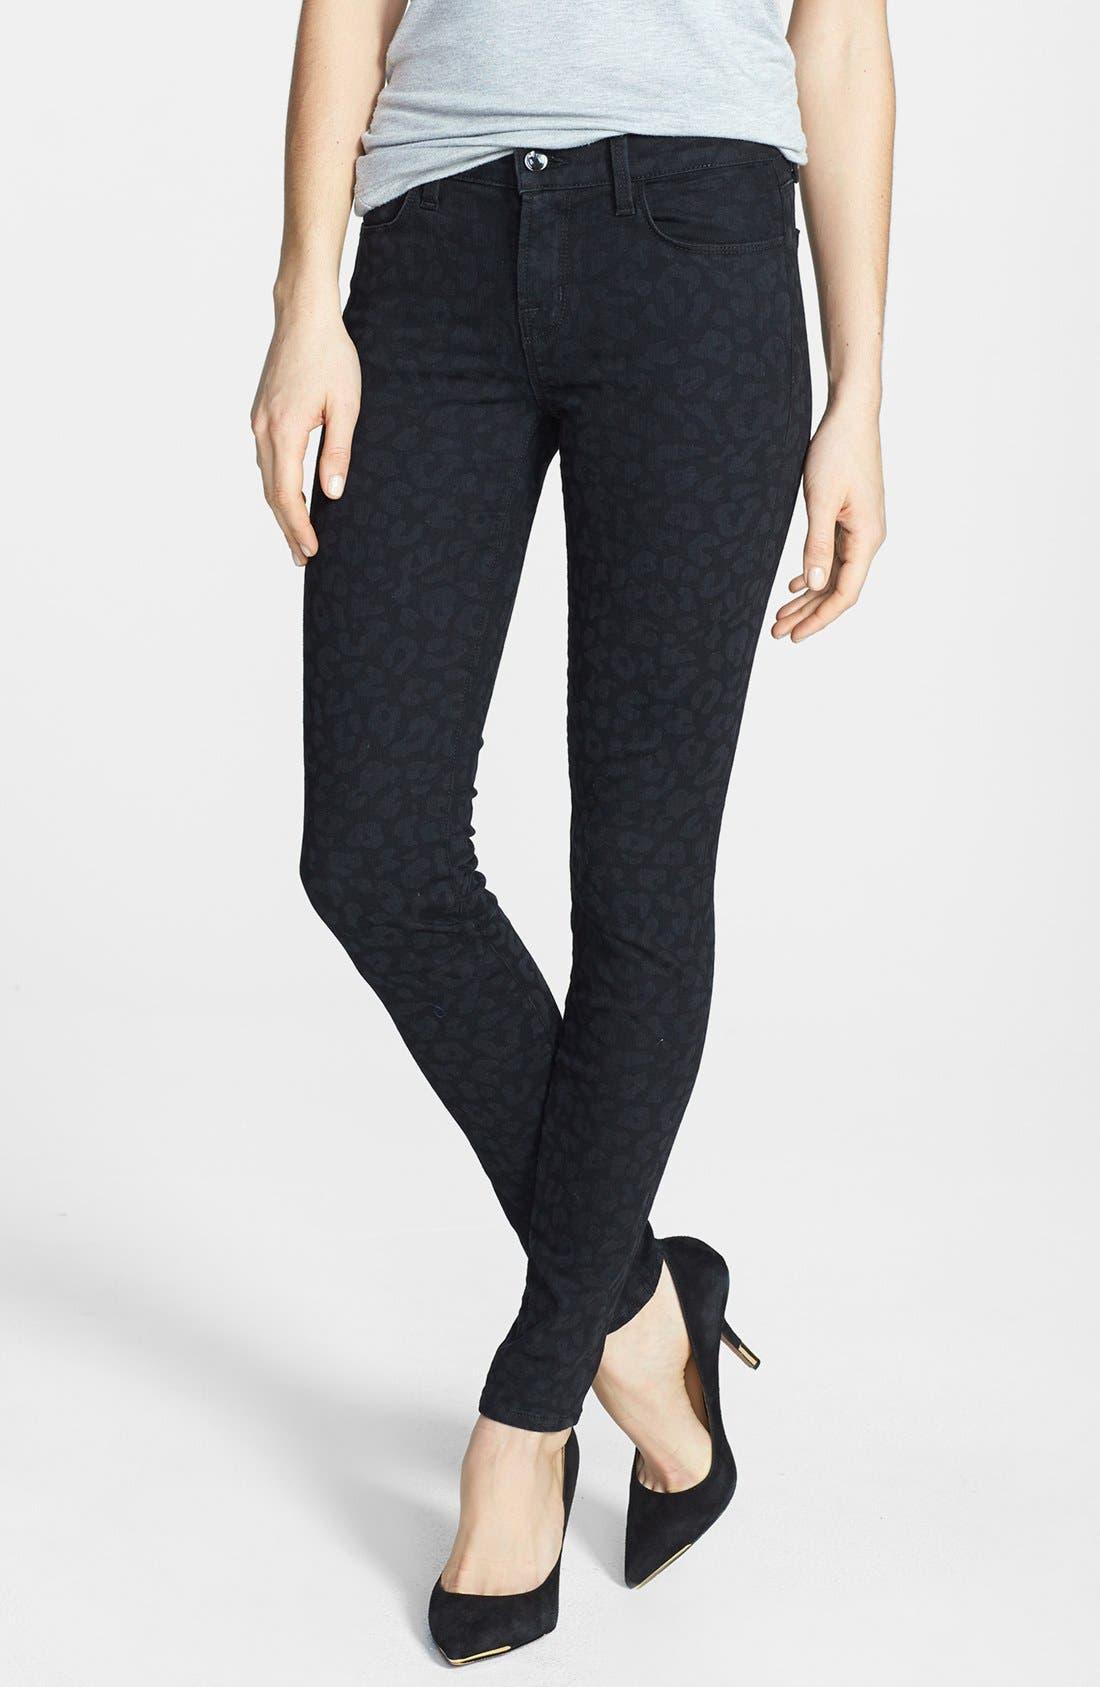 Main Image - J Brand '620' Mid Rise Skinny Jeans (Black Leopard)